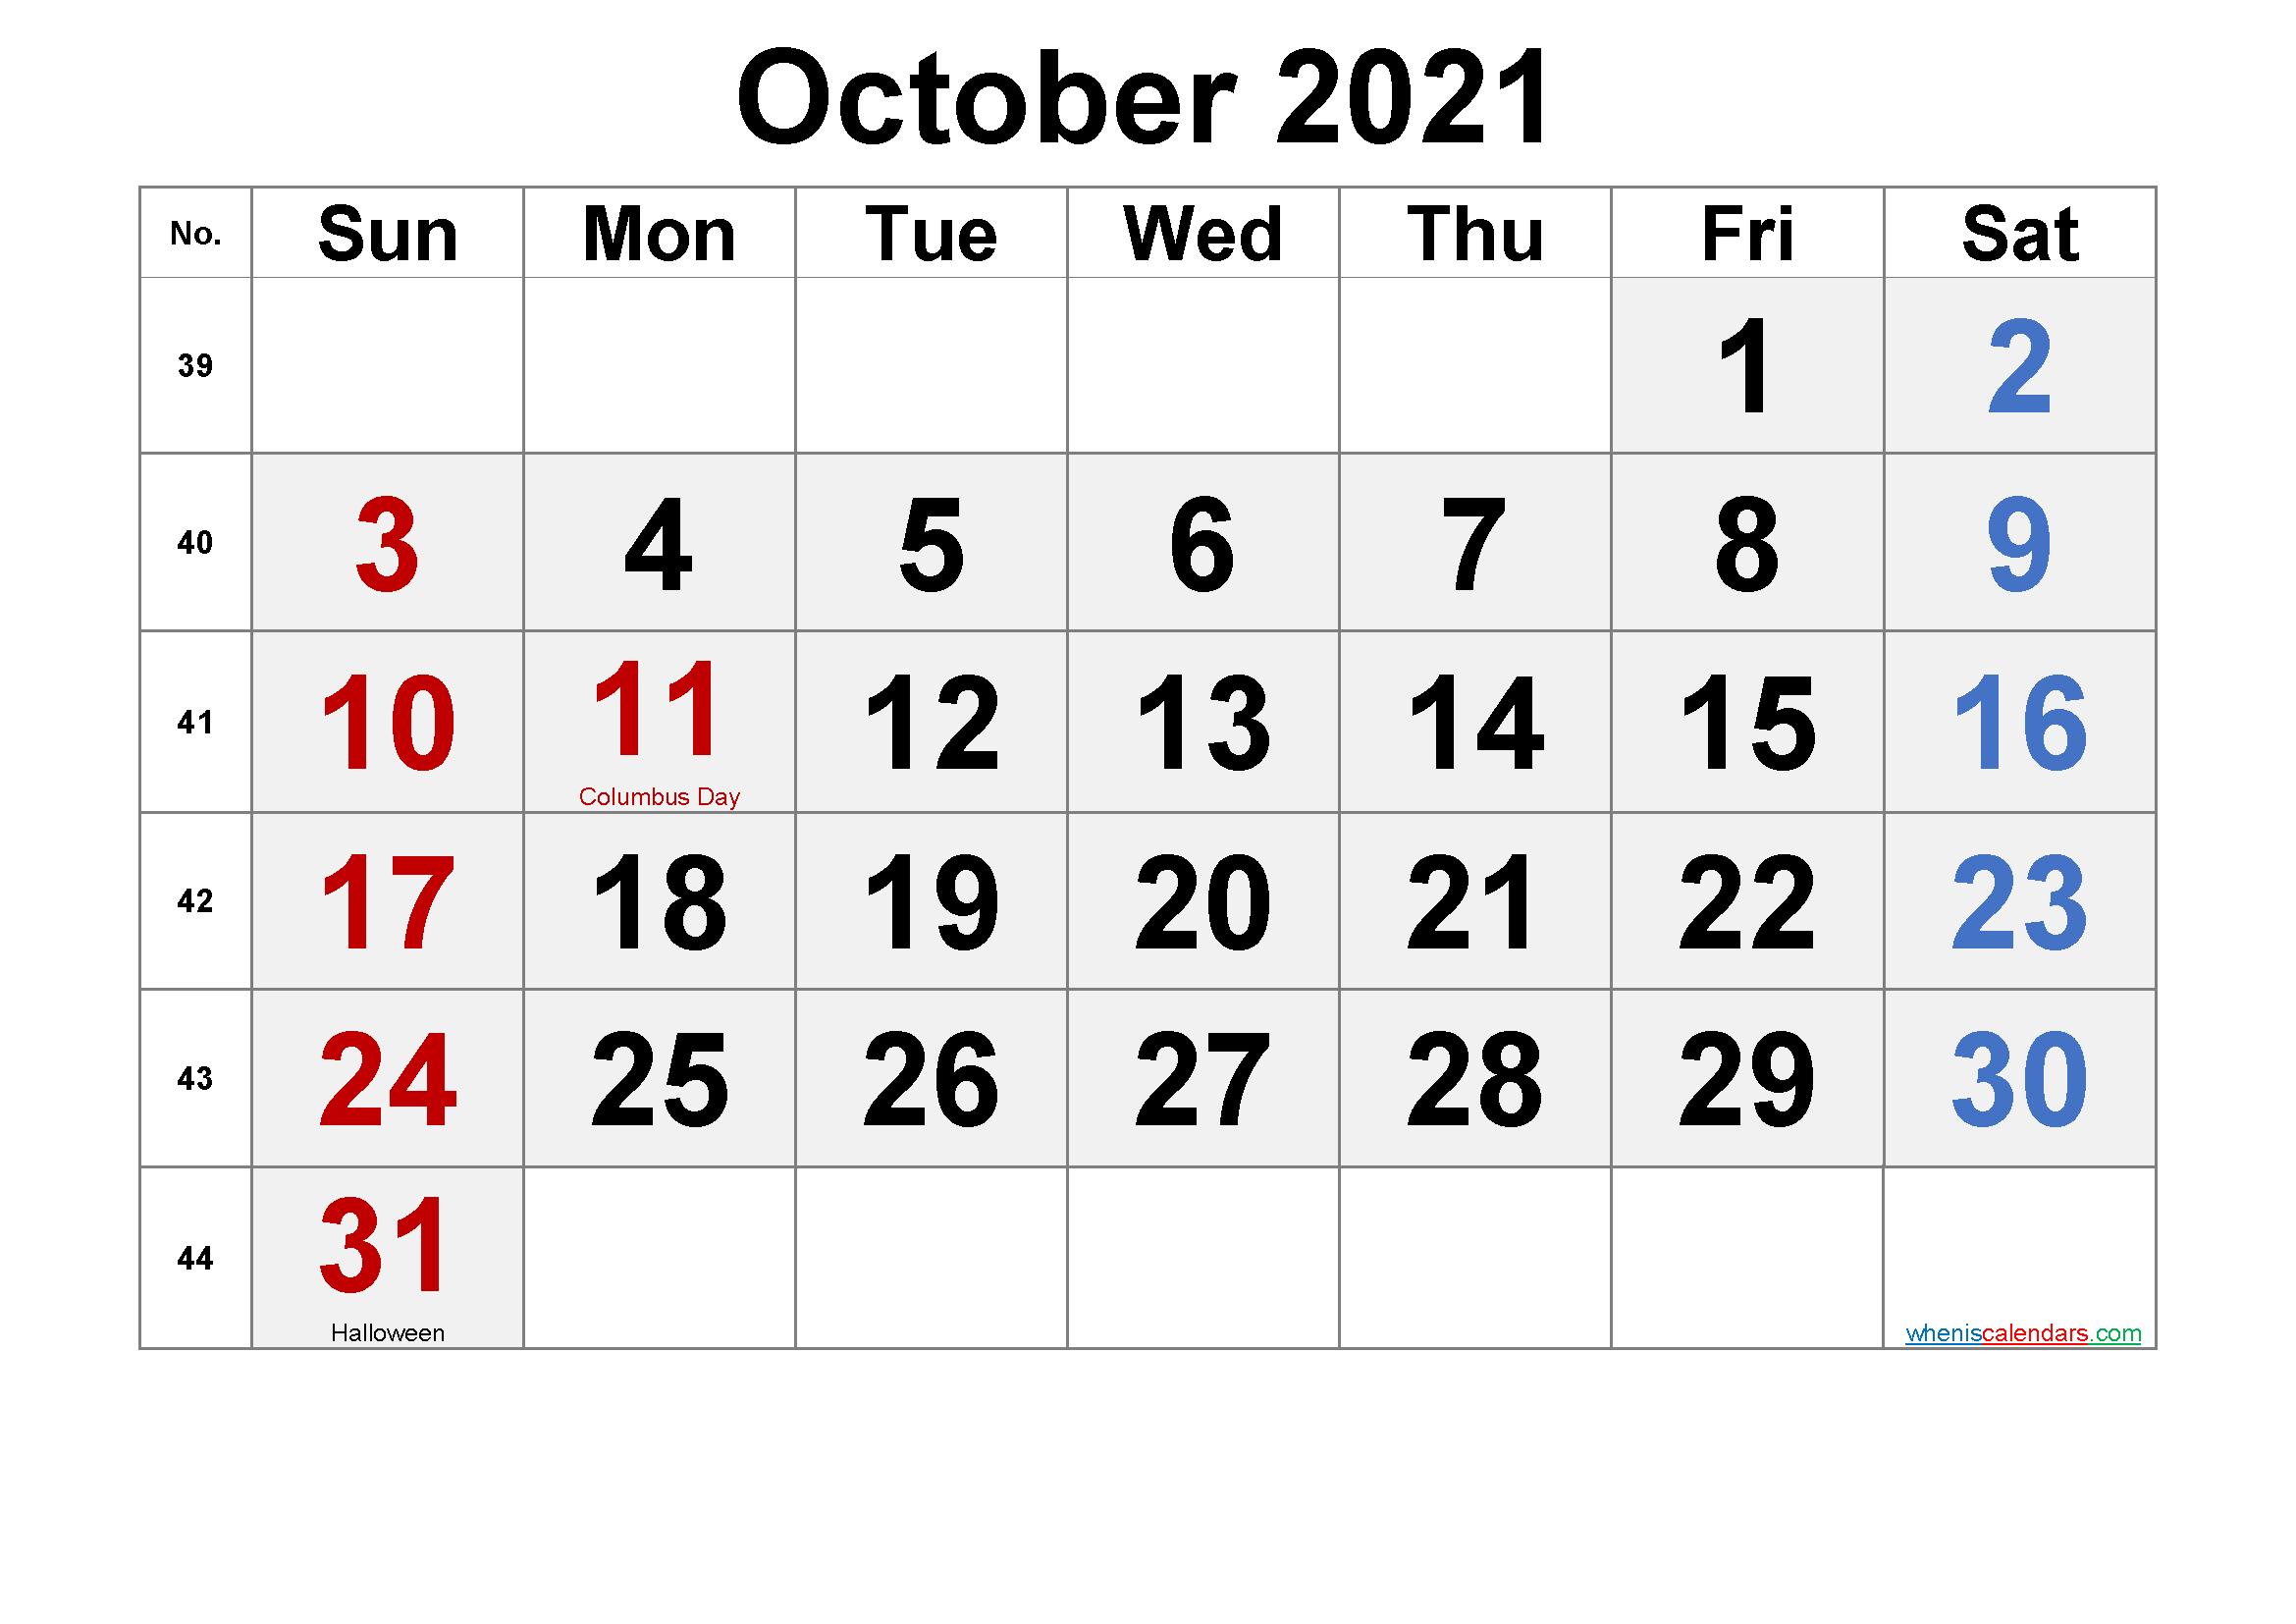 October 2021 Calendar With Holidays Printable-Template No